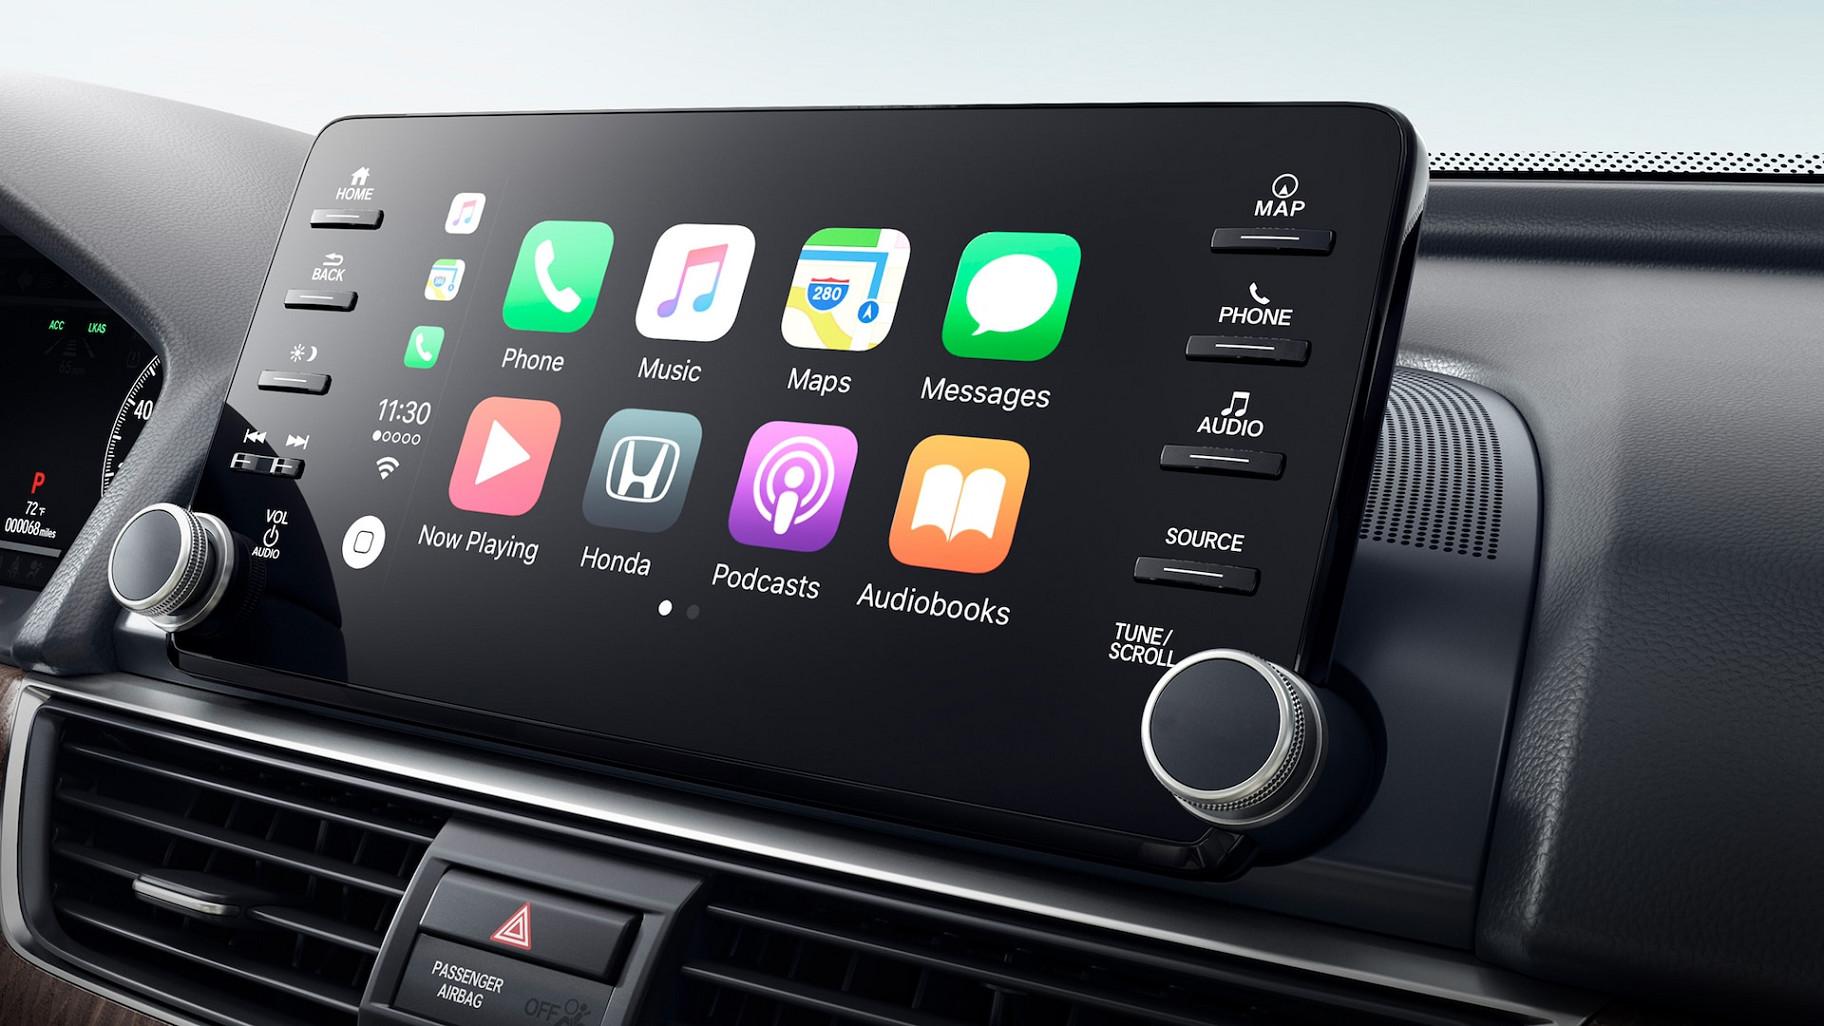 Apple CarPlay™ in the 2020 Accord